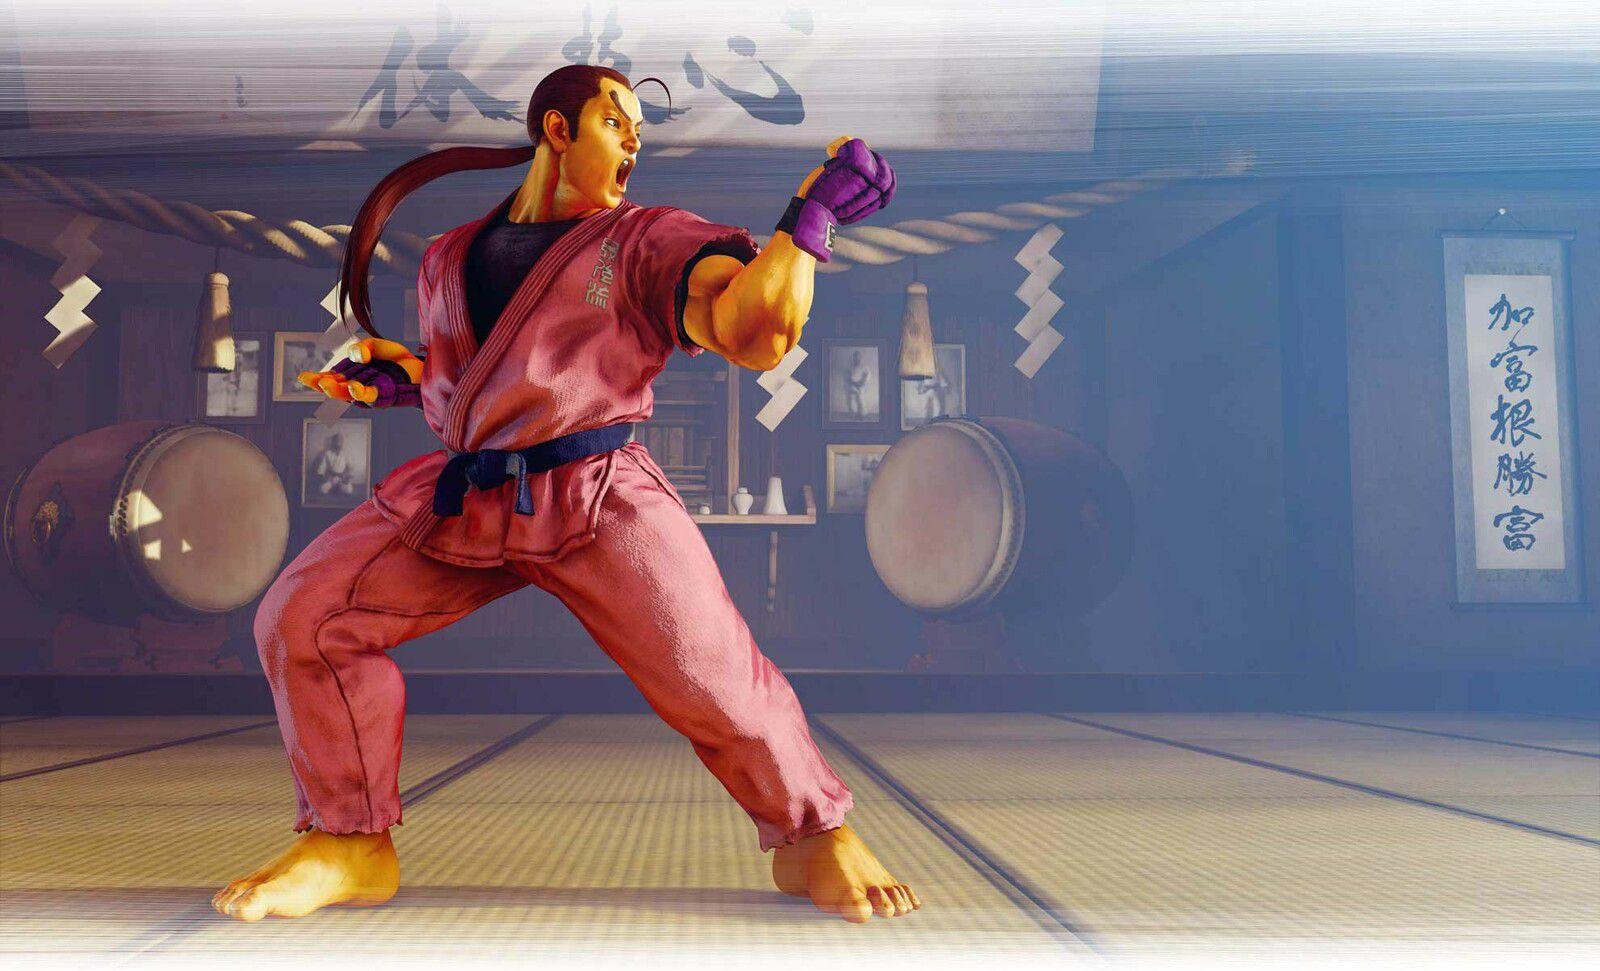 [TEST] STREET FIGHTER V CHAMPION EDITION - DLC - SEASON PASS 5 - PS4